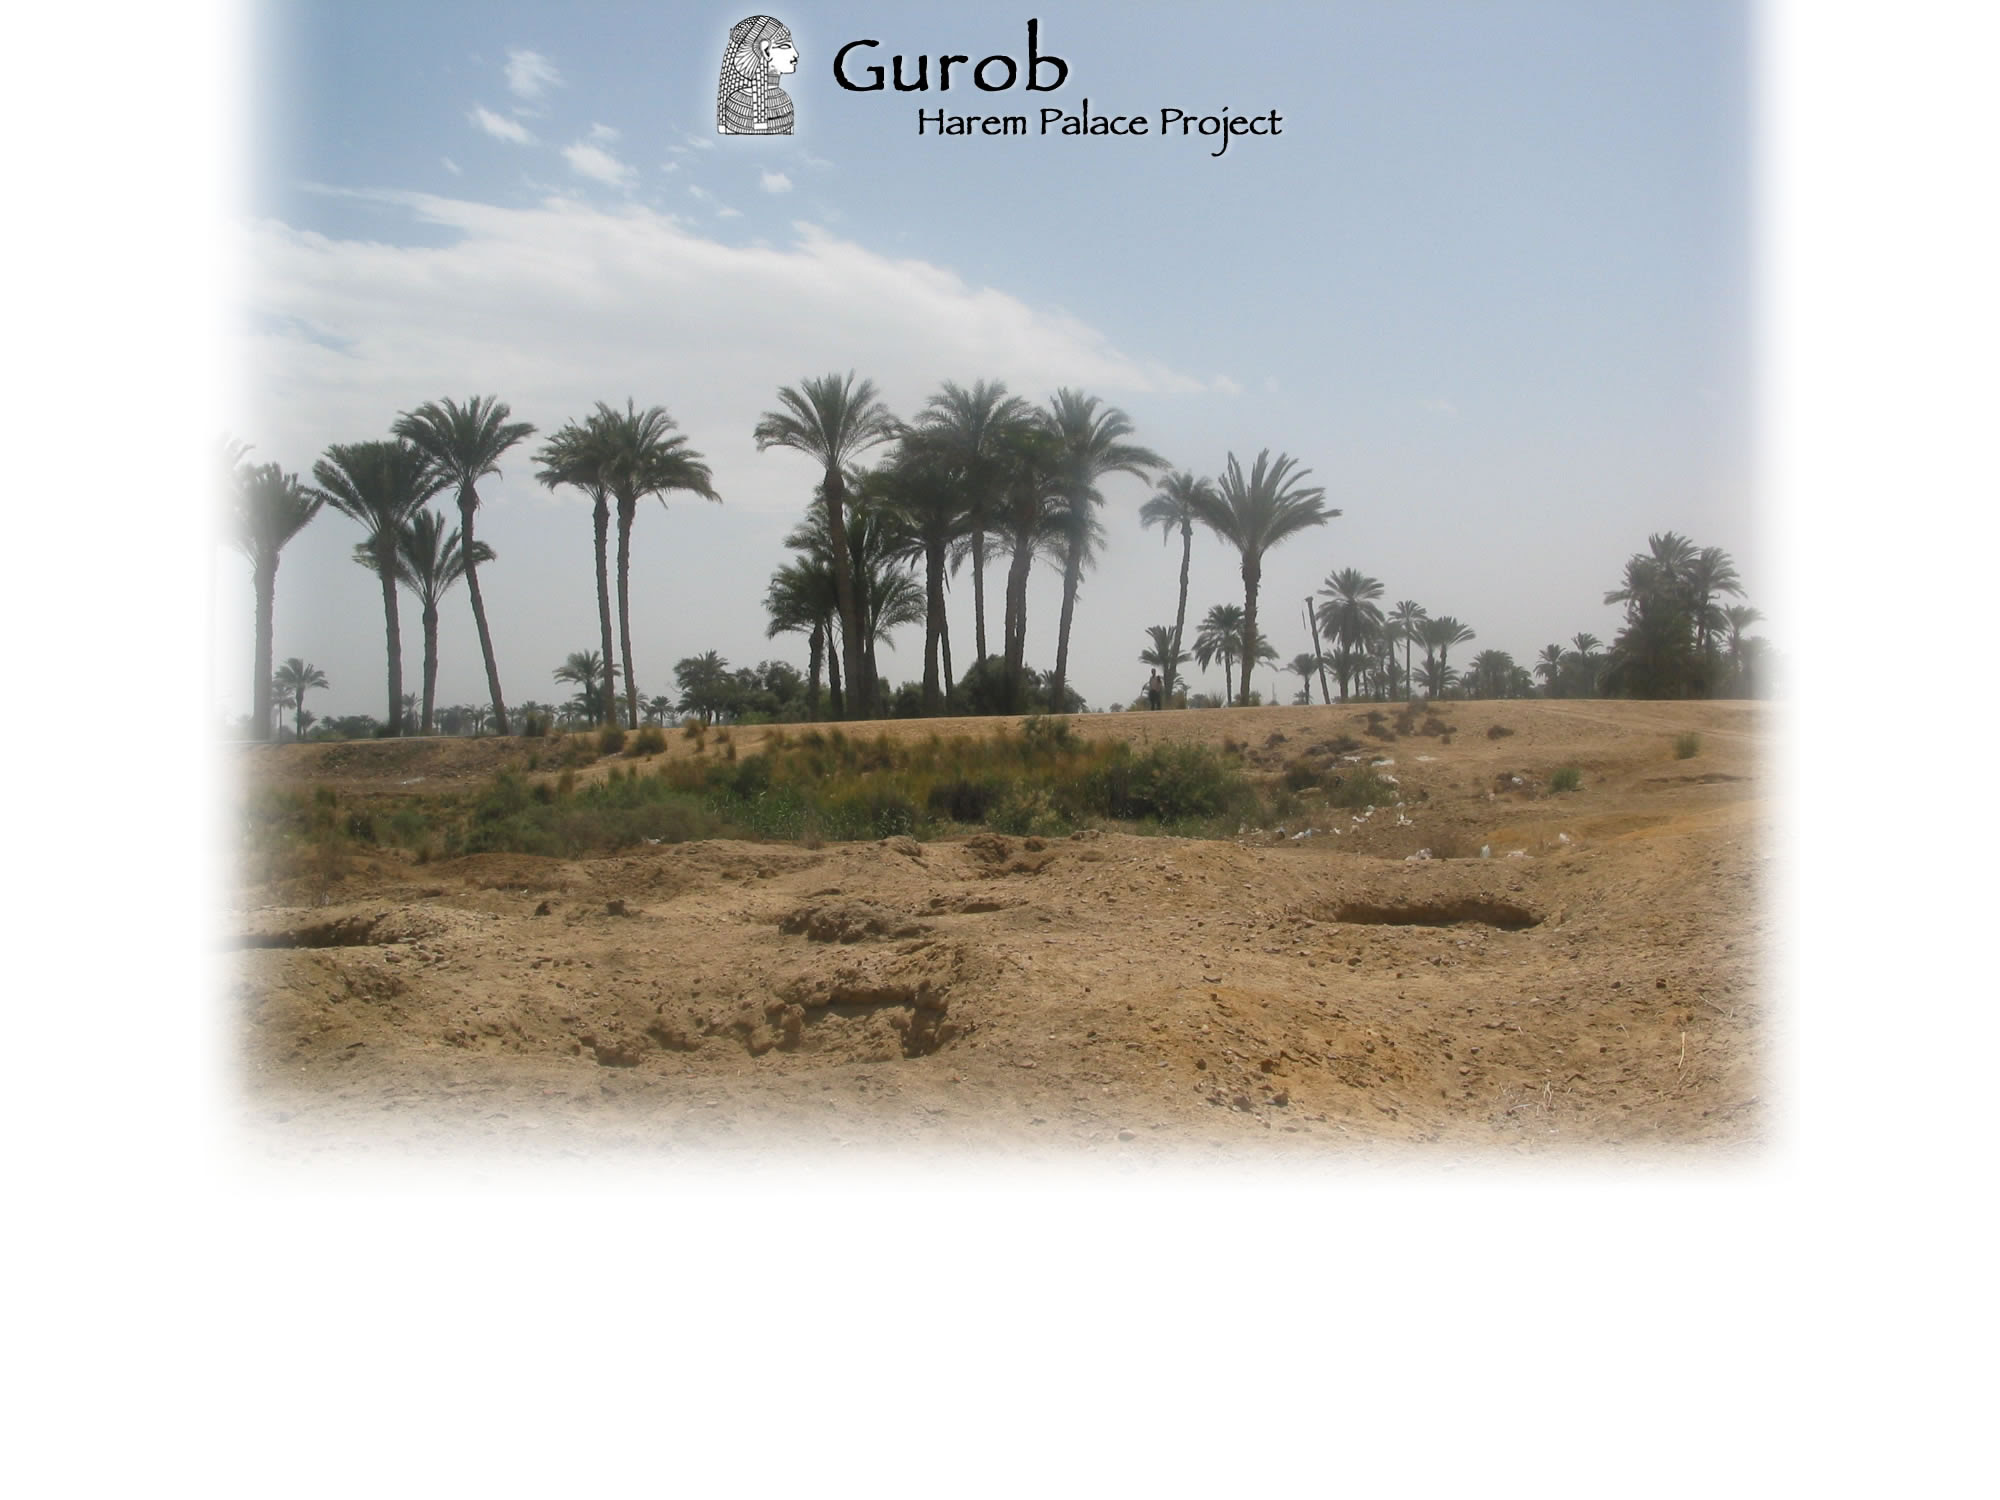 http://www.gurob.org.uk/images/background.jpg